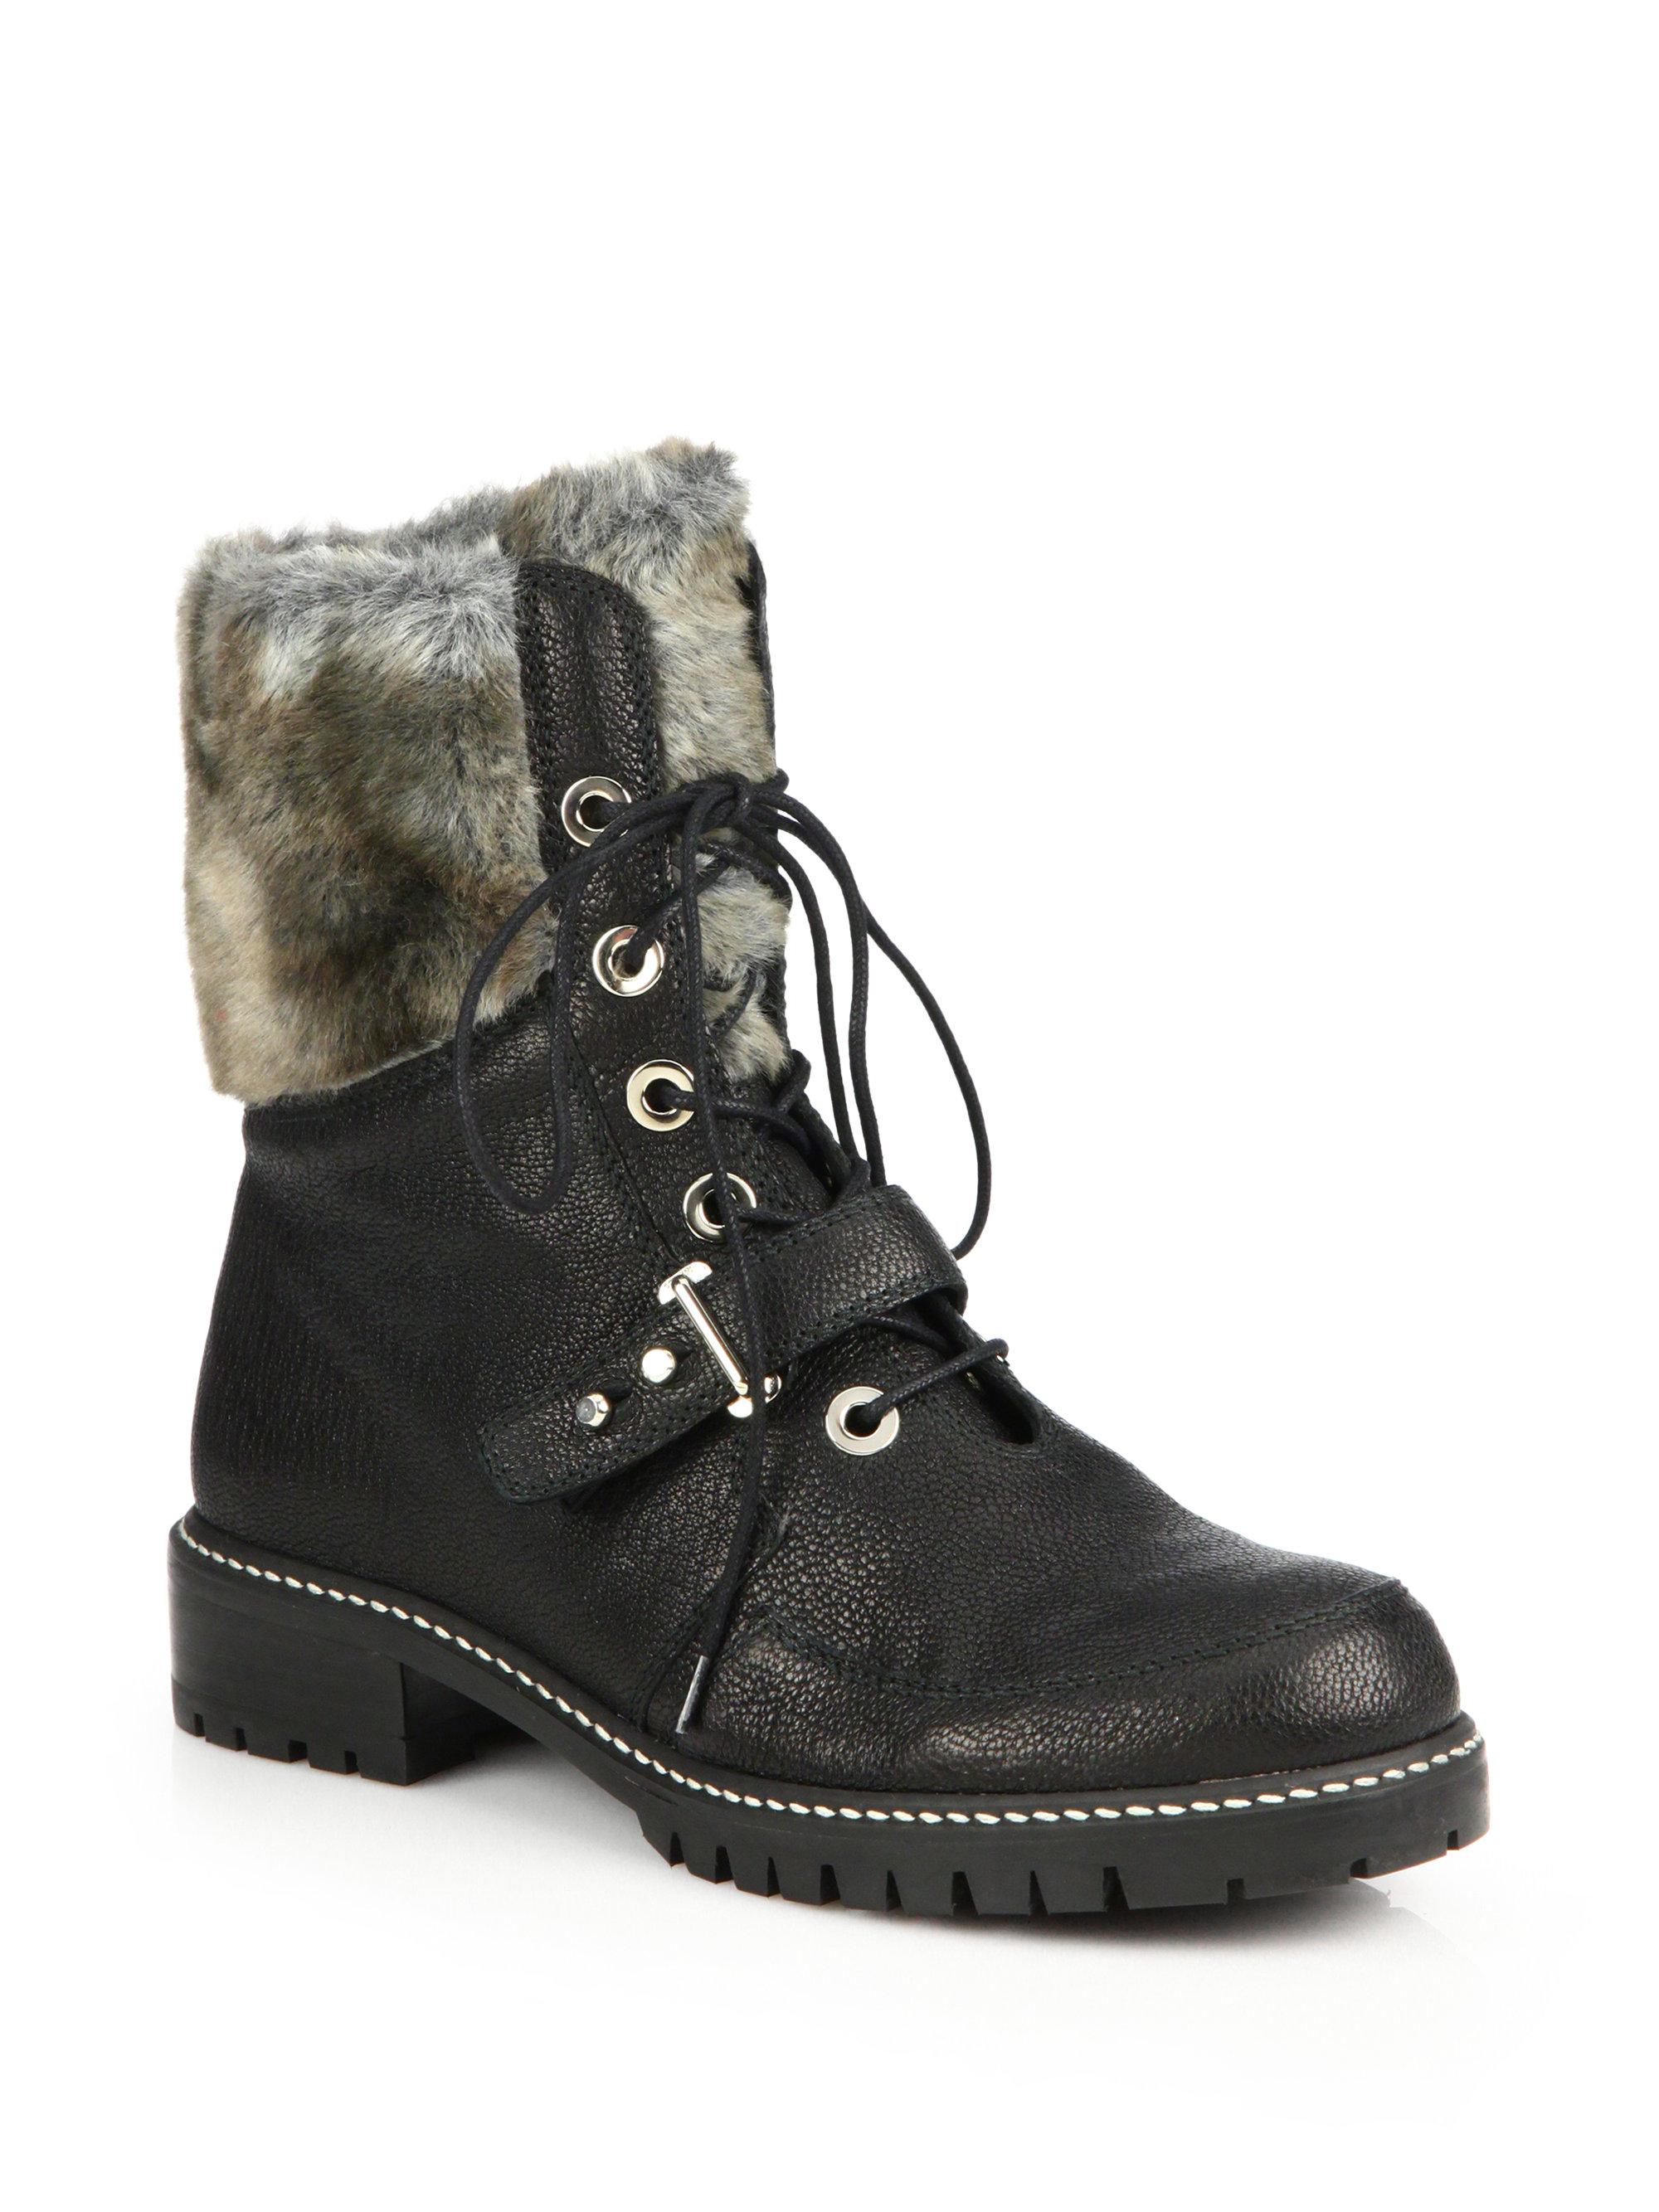 stuart weitzman viking leather faux fur lace up boots in black lyst. Black Bedroom Furniture Sets. Home Design Ideas